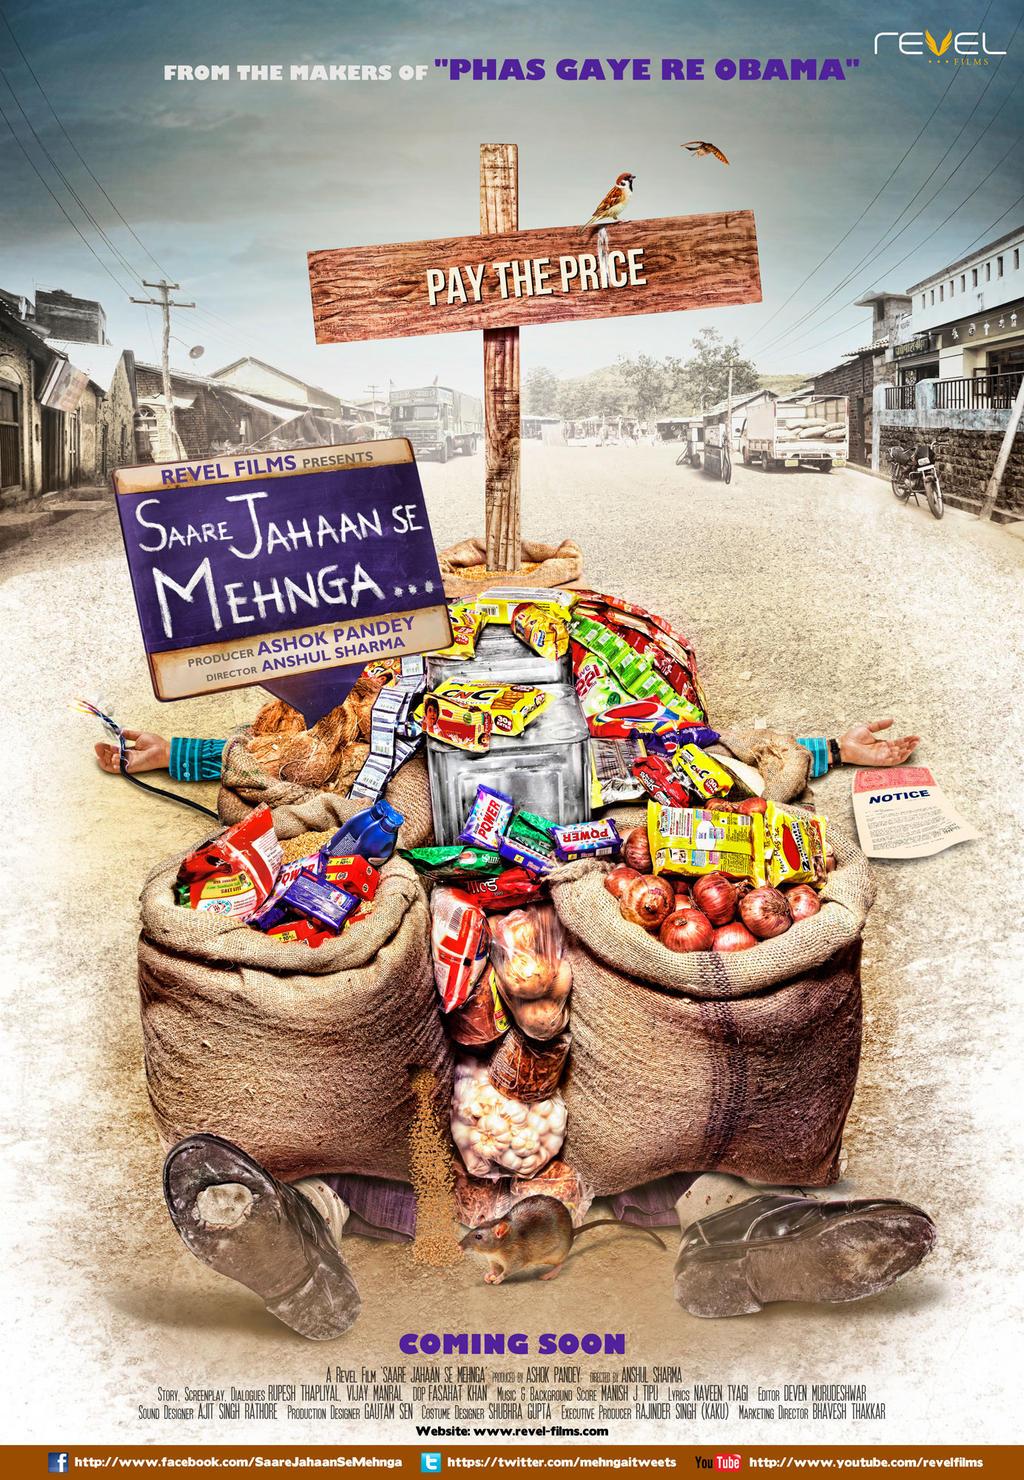 Saare Jahaan Se Mehnga - Movie Poster #1 (Original)